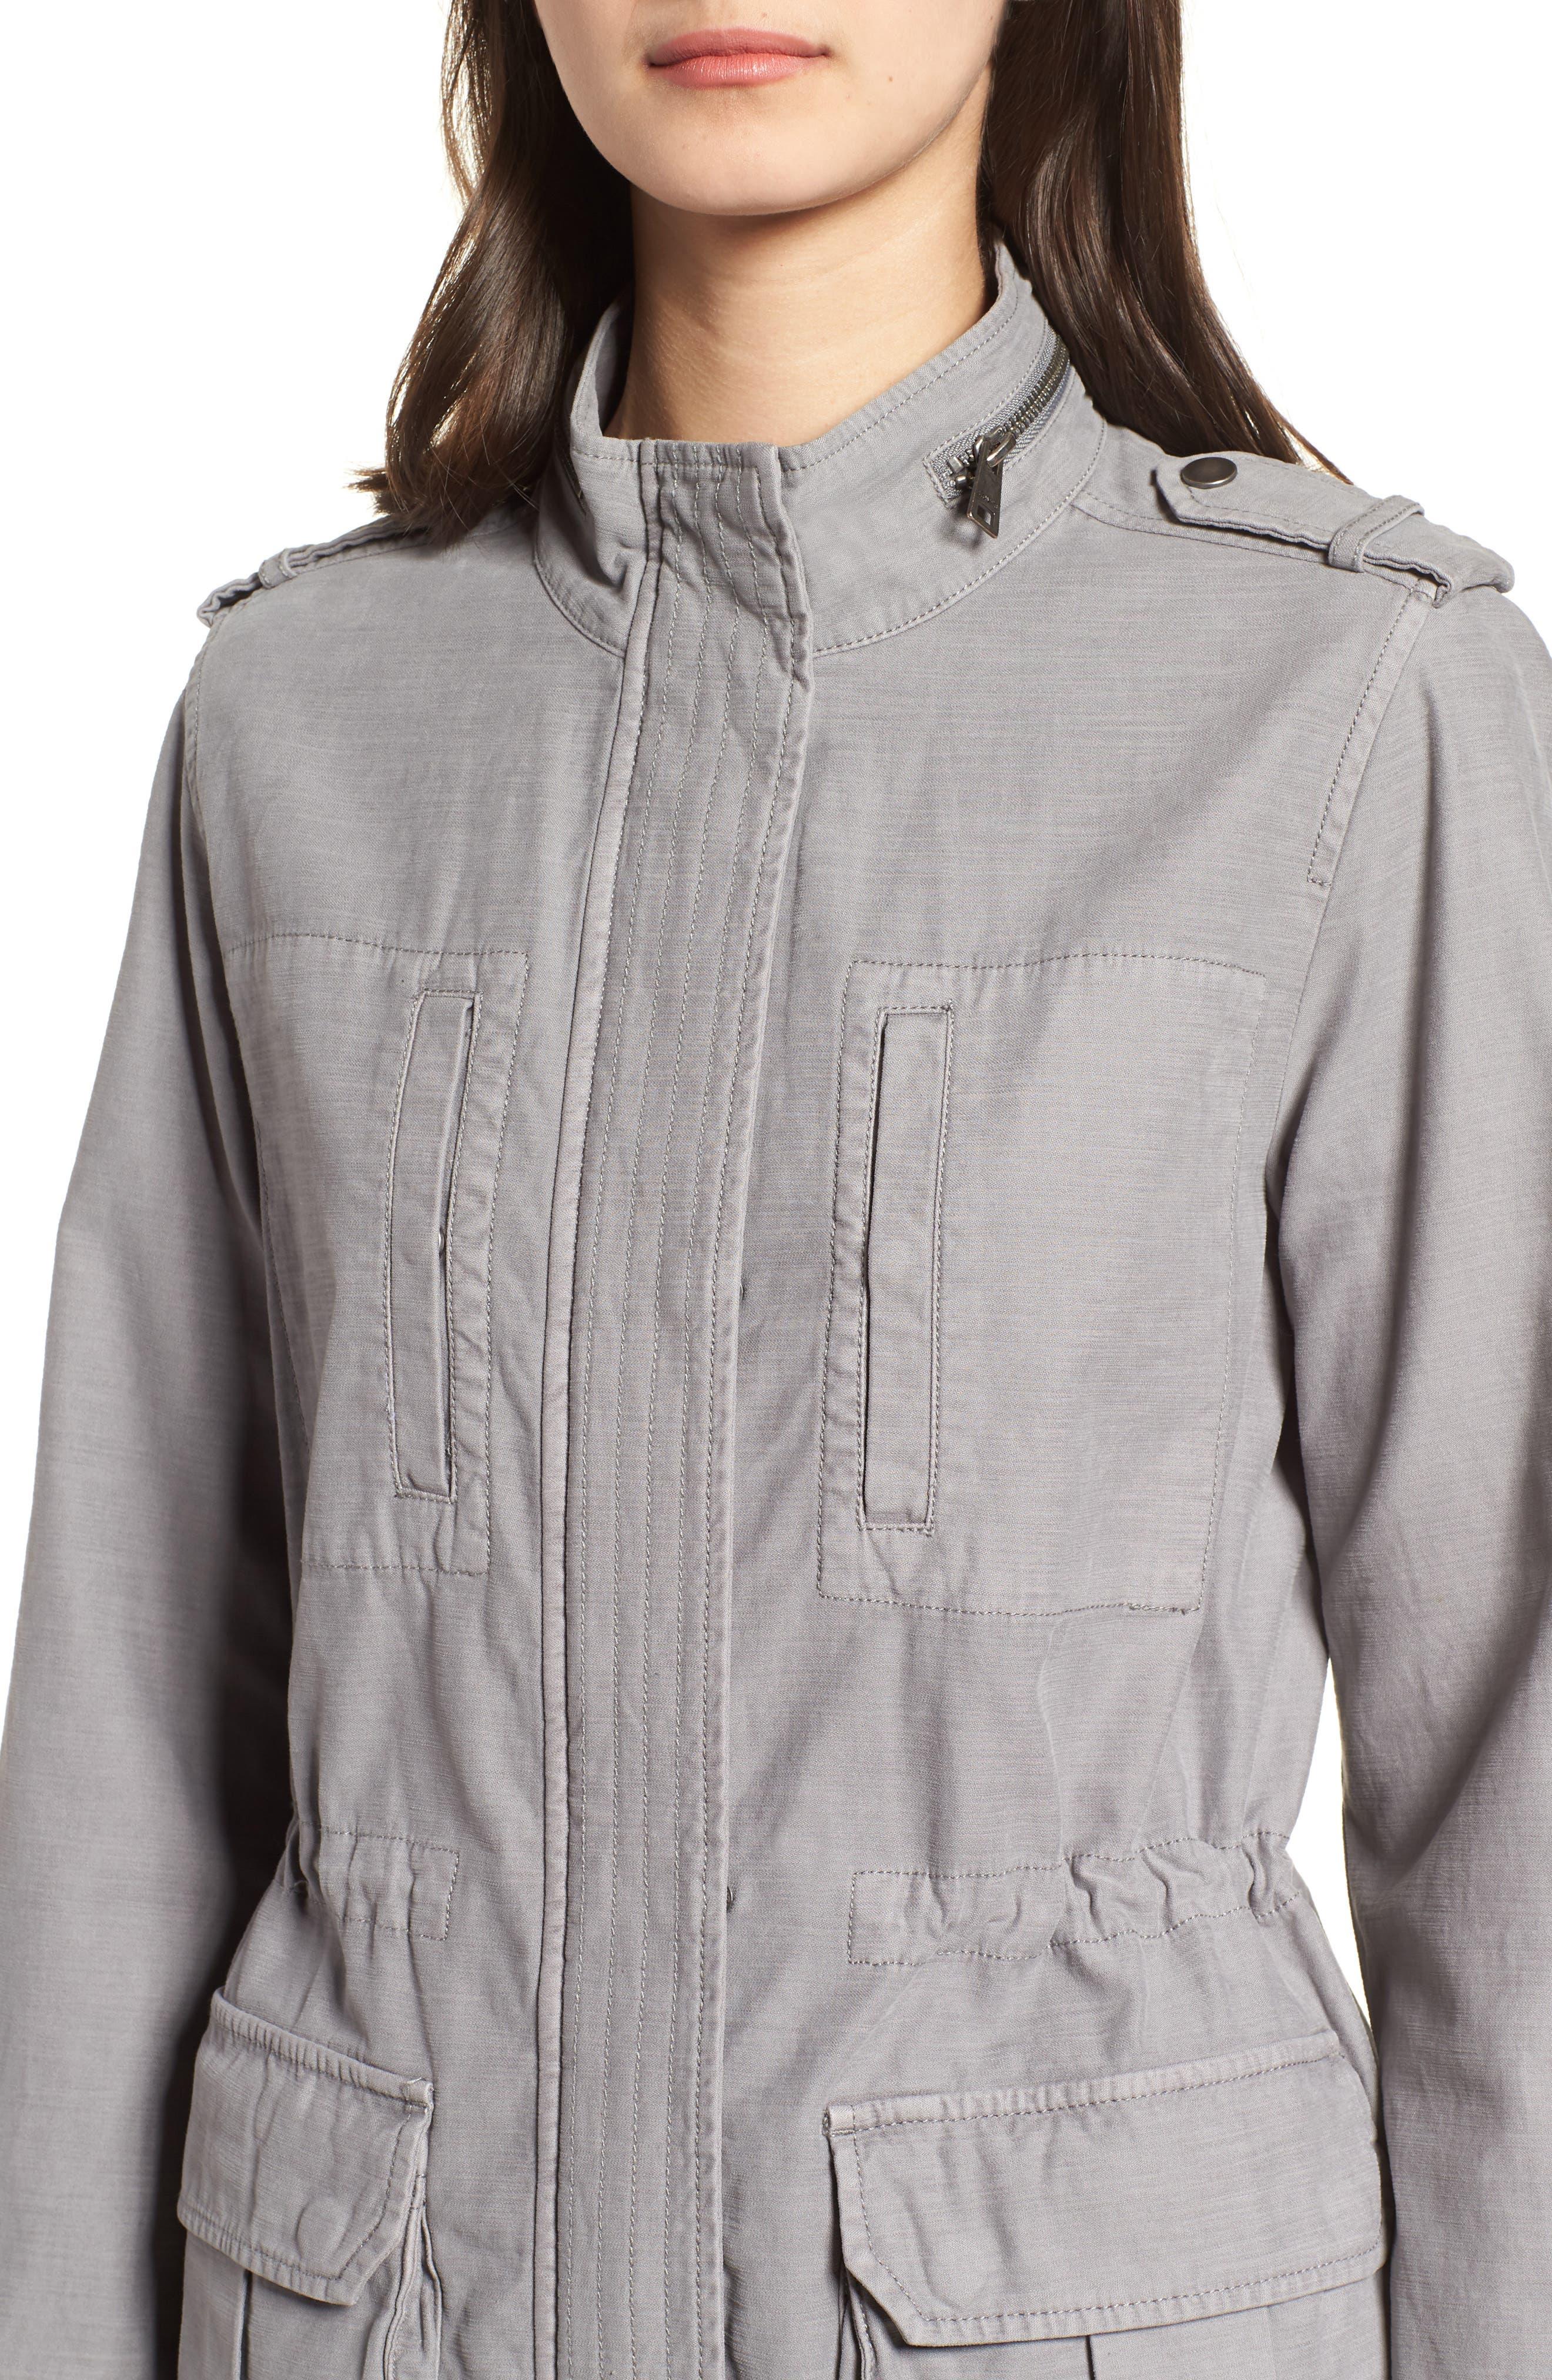 Cotton 4-Pocket Jacket,                             Alternate thumbnail 4, color,                             030